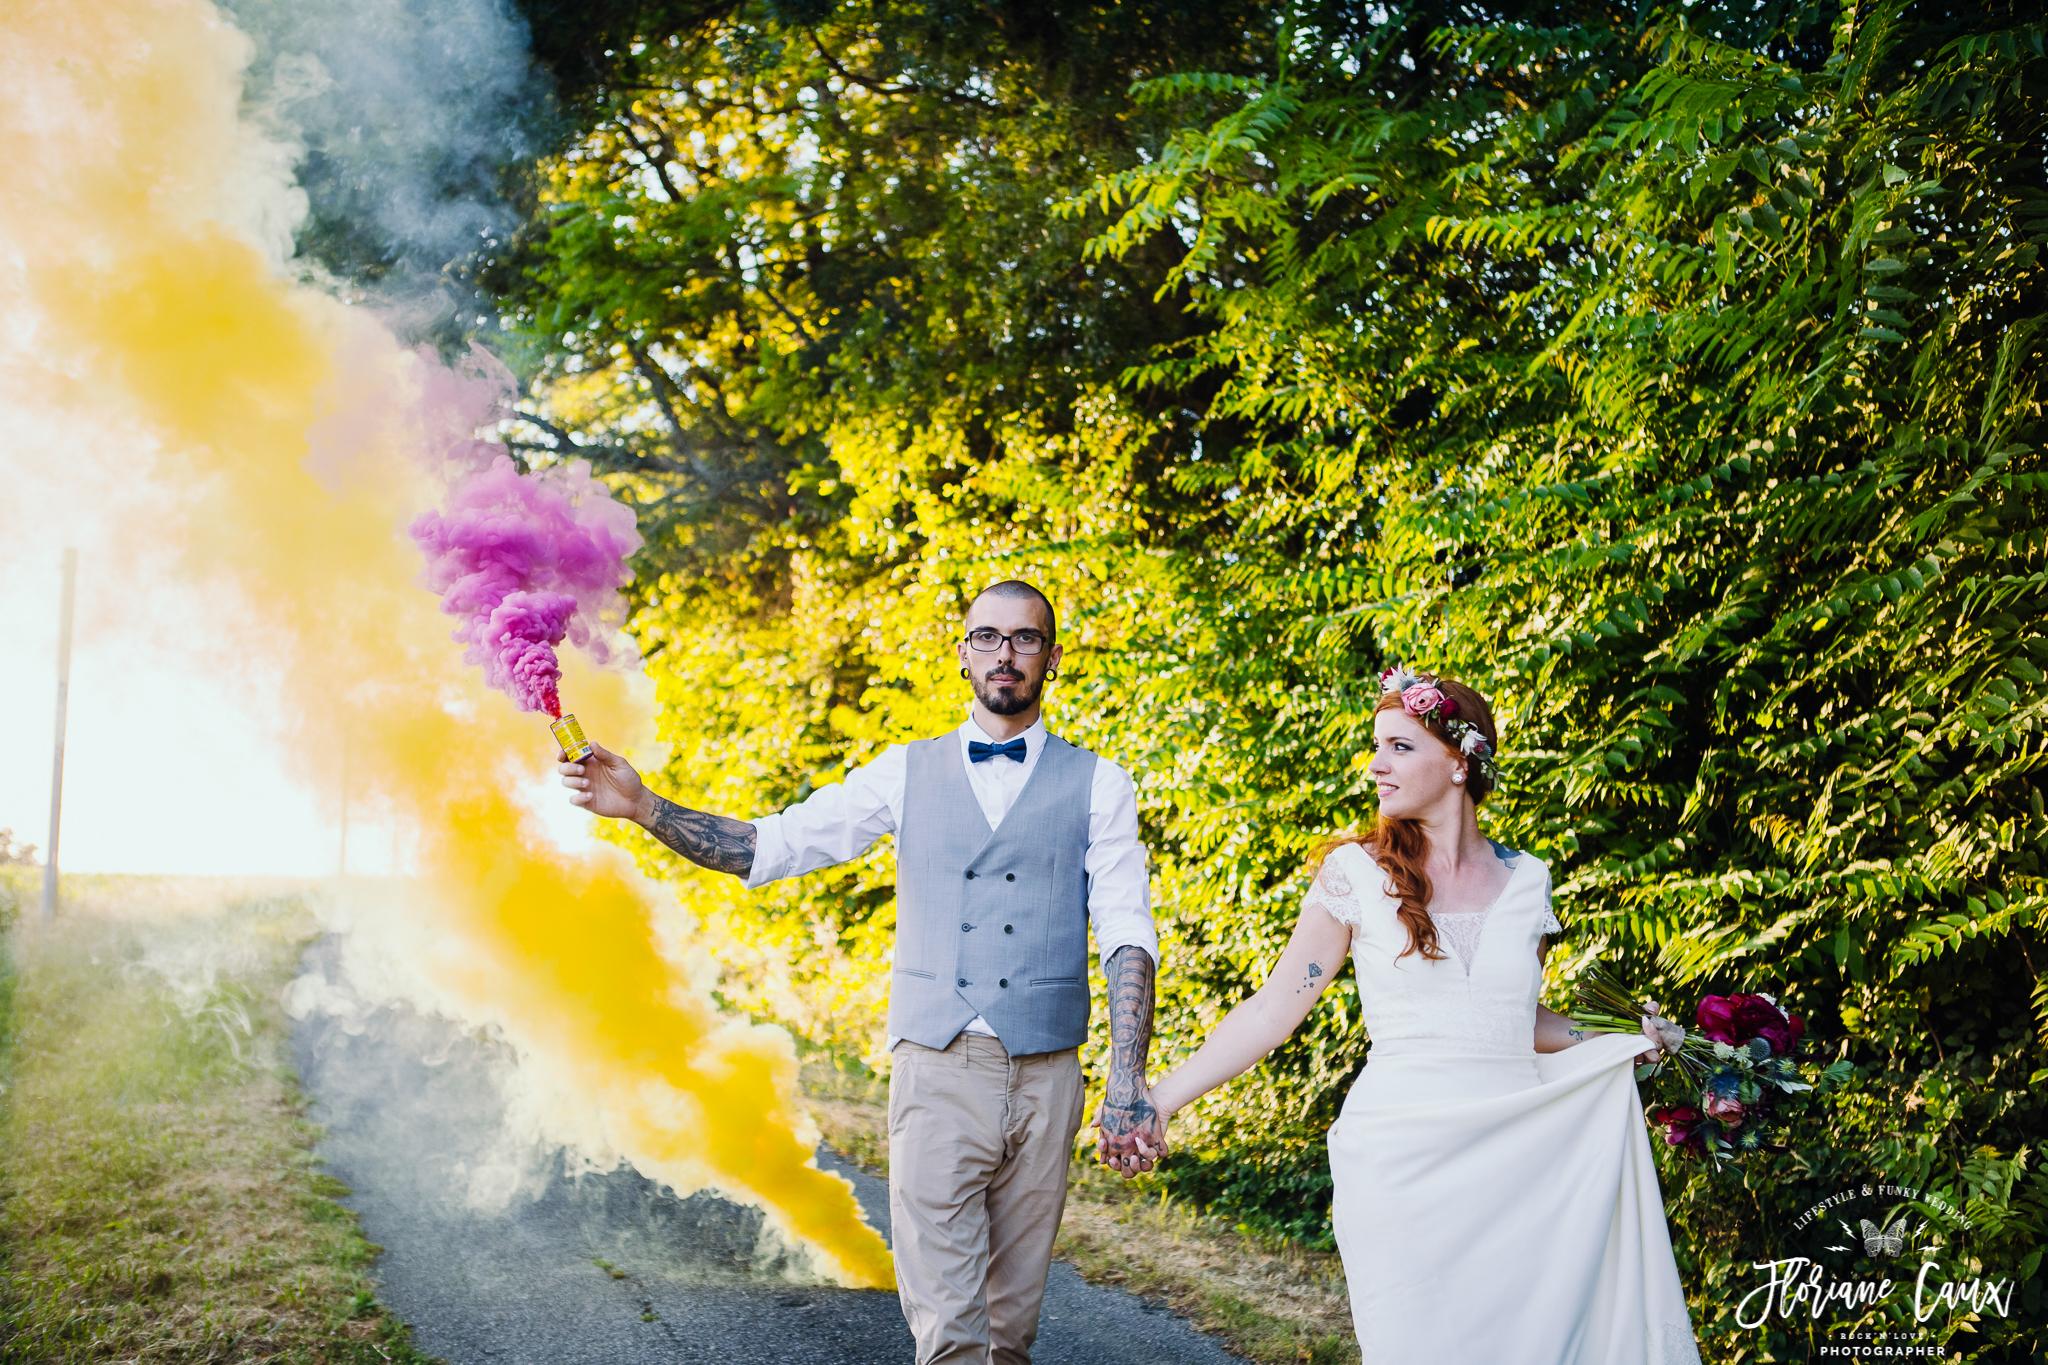 photographe-mariage-toulouse-rocknroll-maries-tatoues-floriane-caux-63